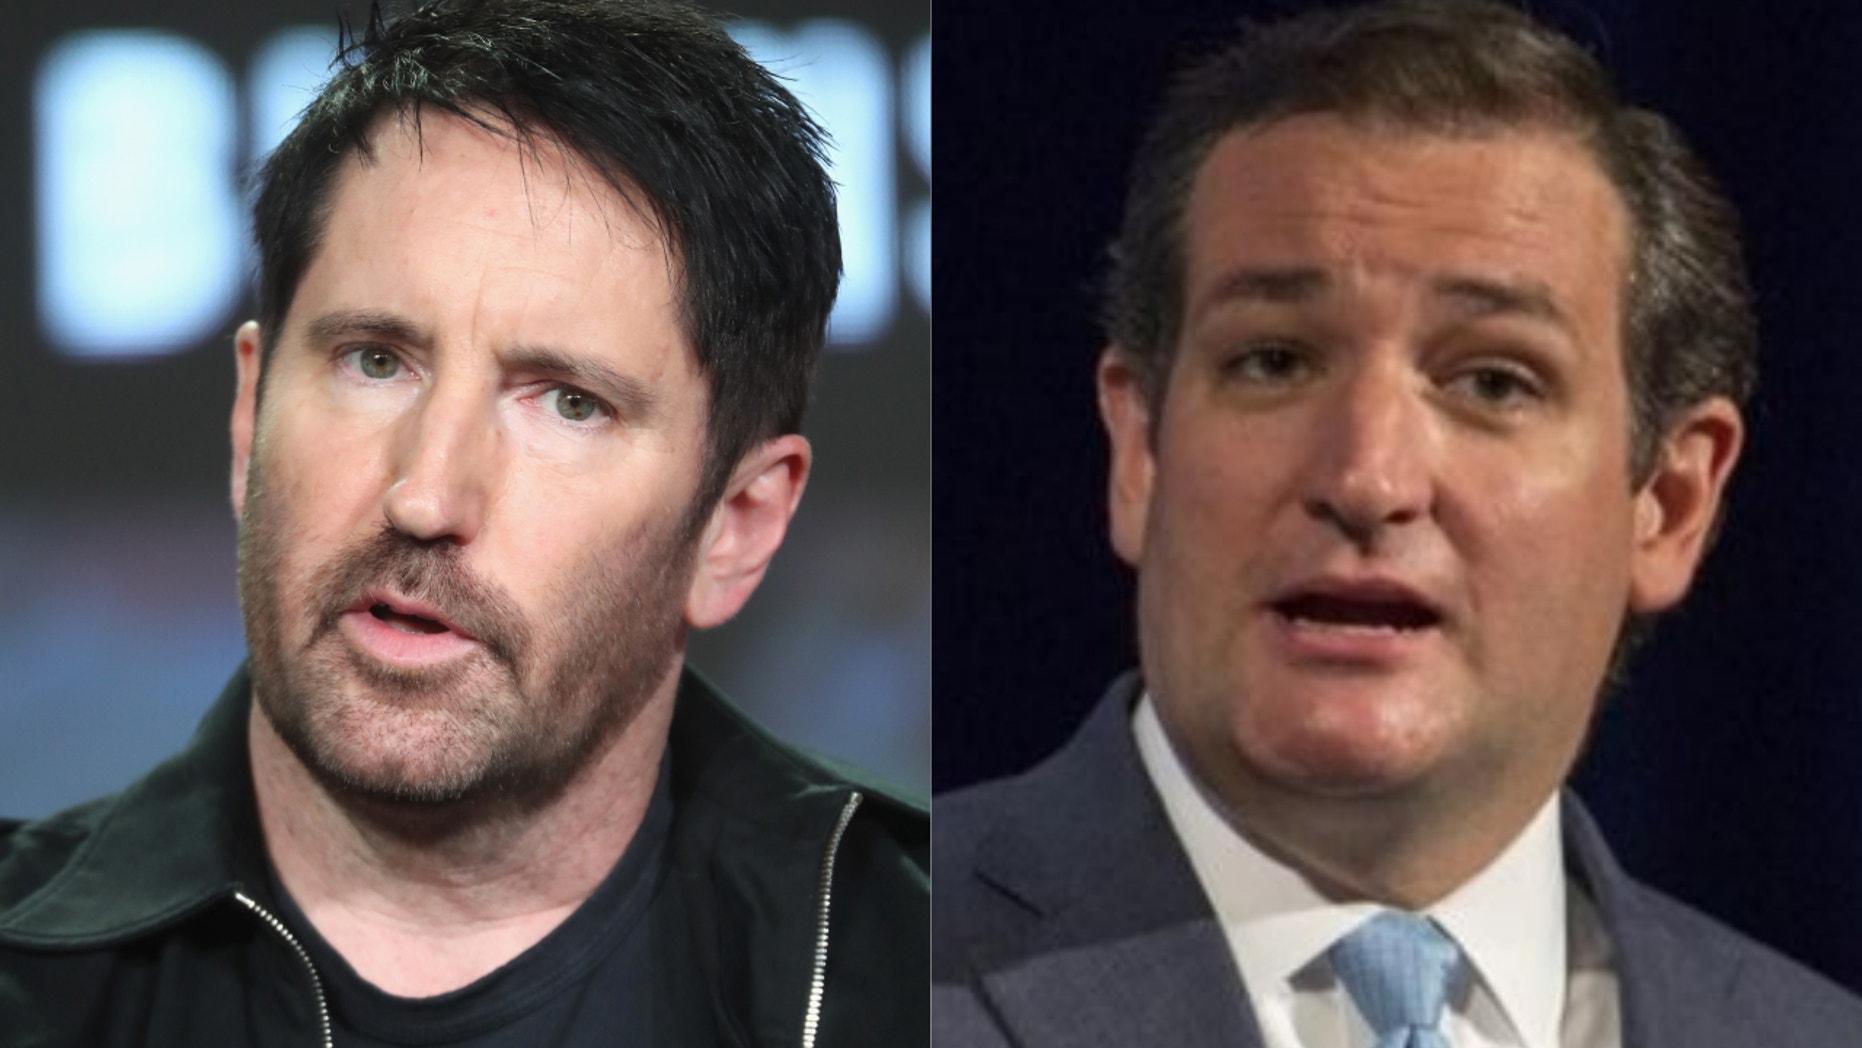 Trent Reznor won't let Ted Cruz attend Nine Inch Nails concert